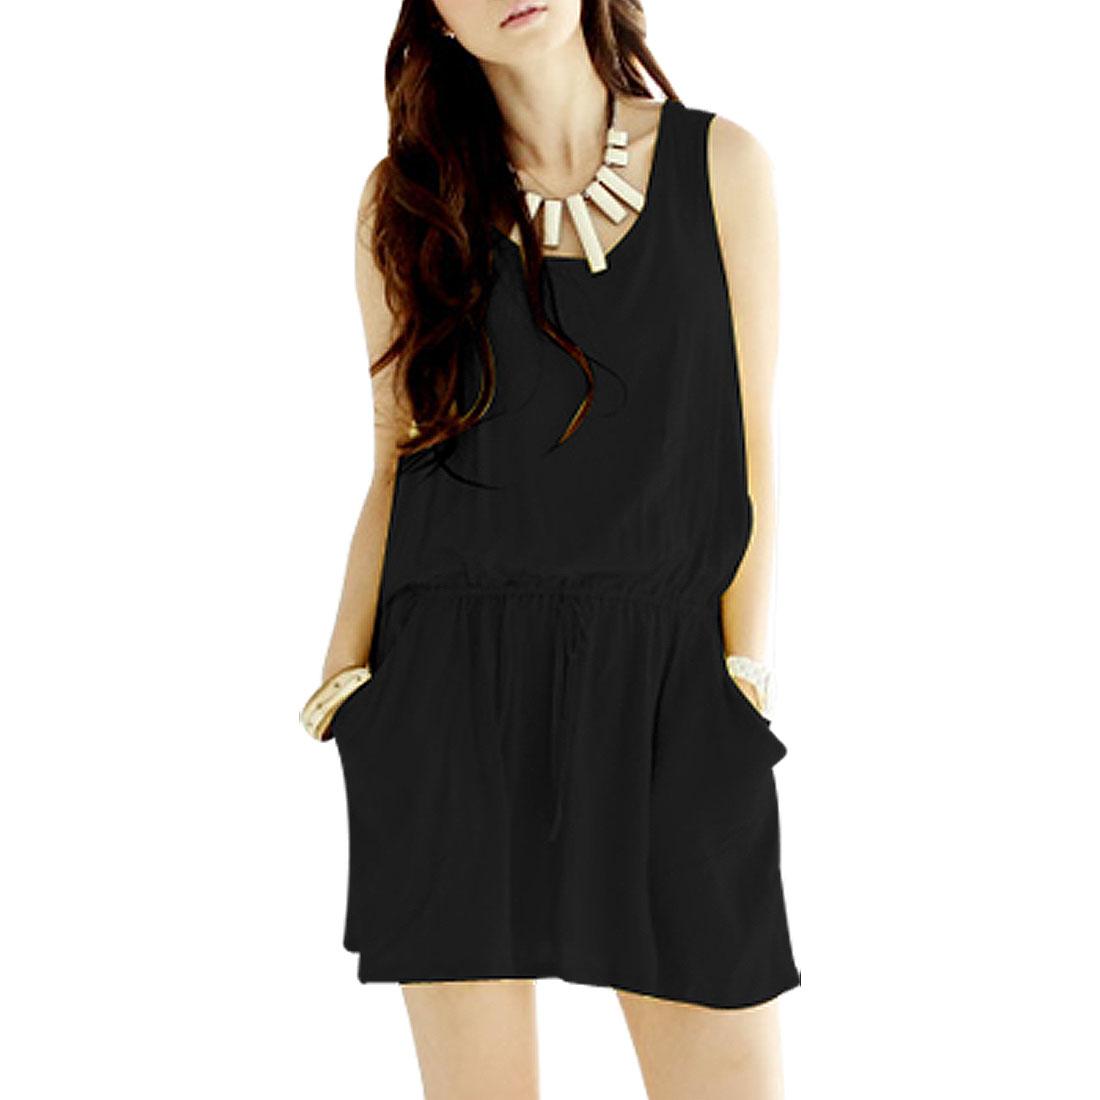 Ladies Scoop Neck Slant Pocket Rackerback Dress Black XS